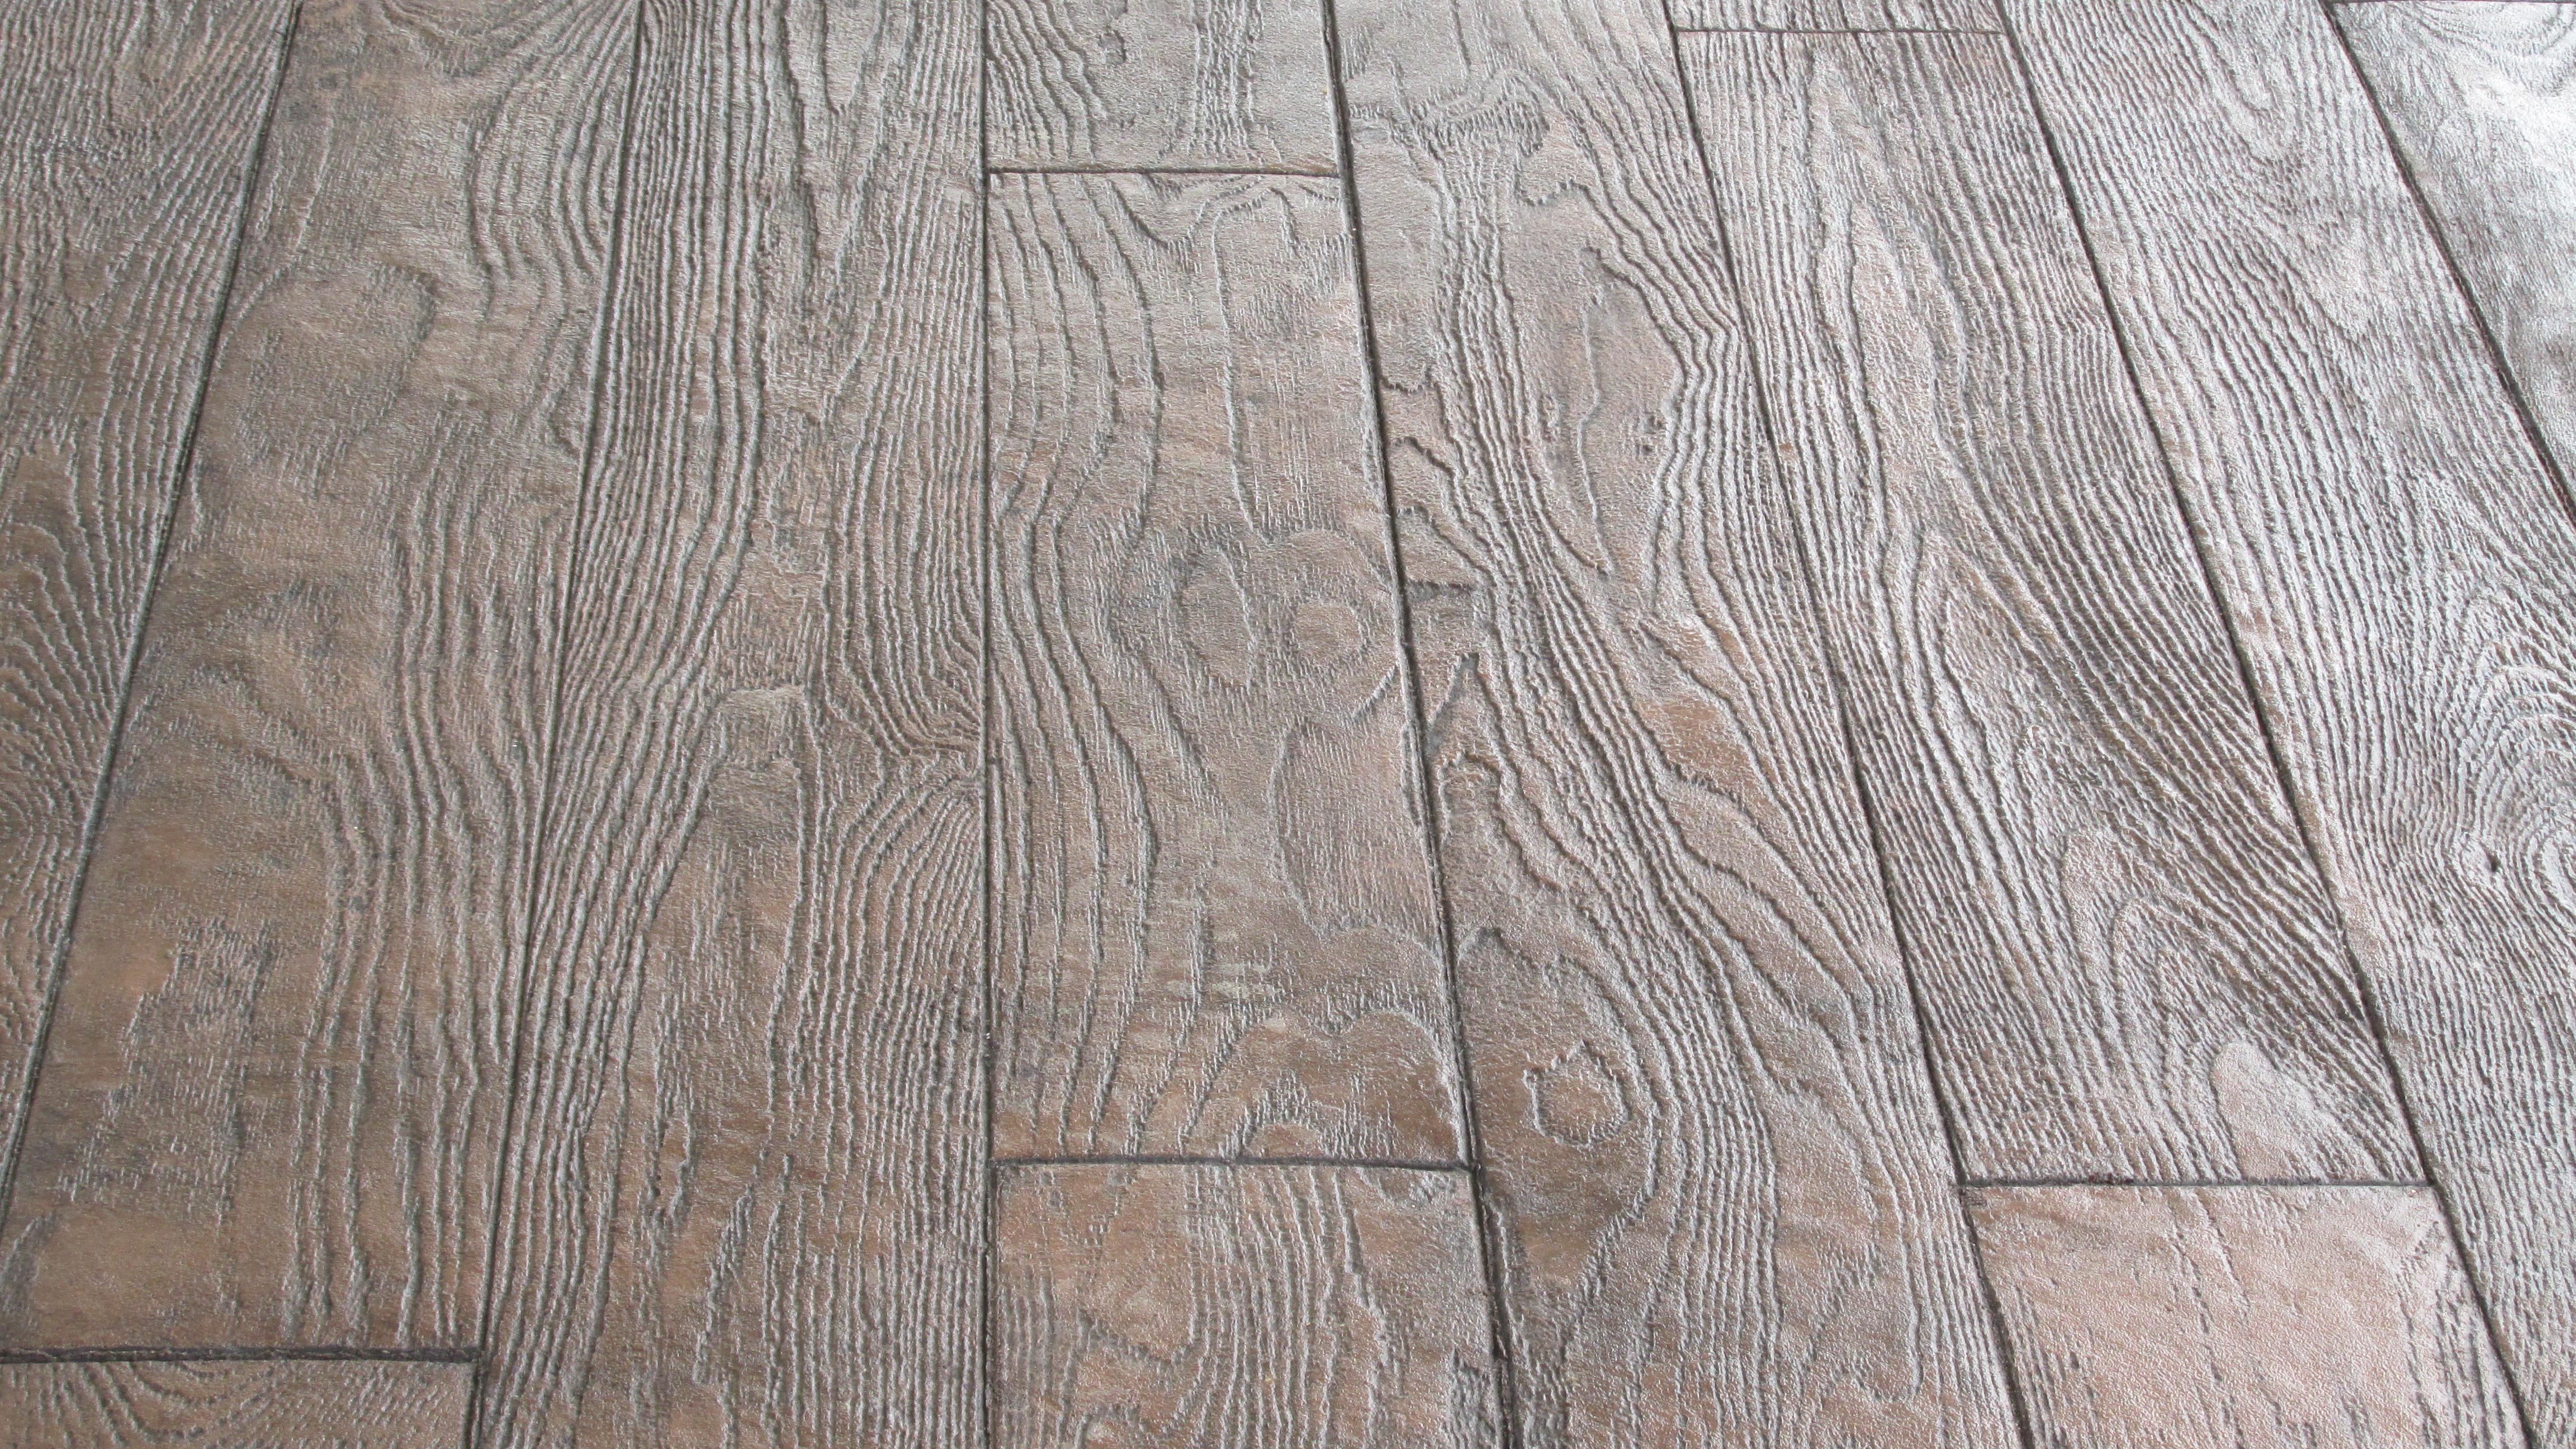 Wood Pattern Stamped Concrete Pattern : Patterns stone pattern paving